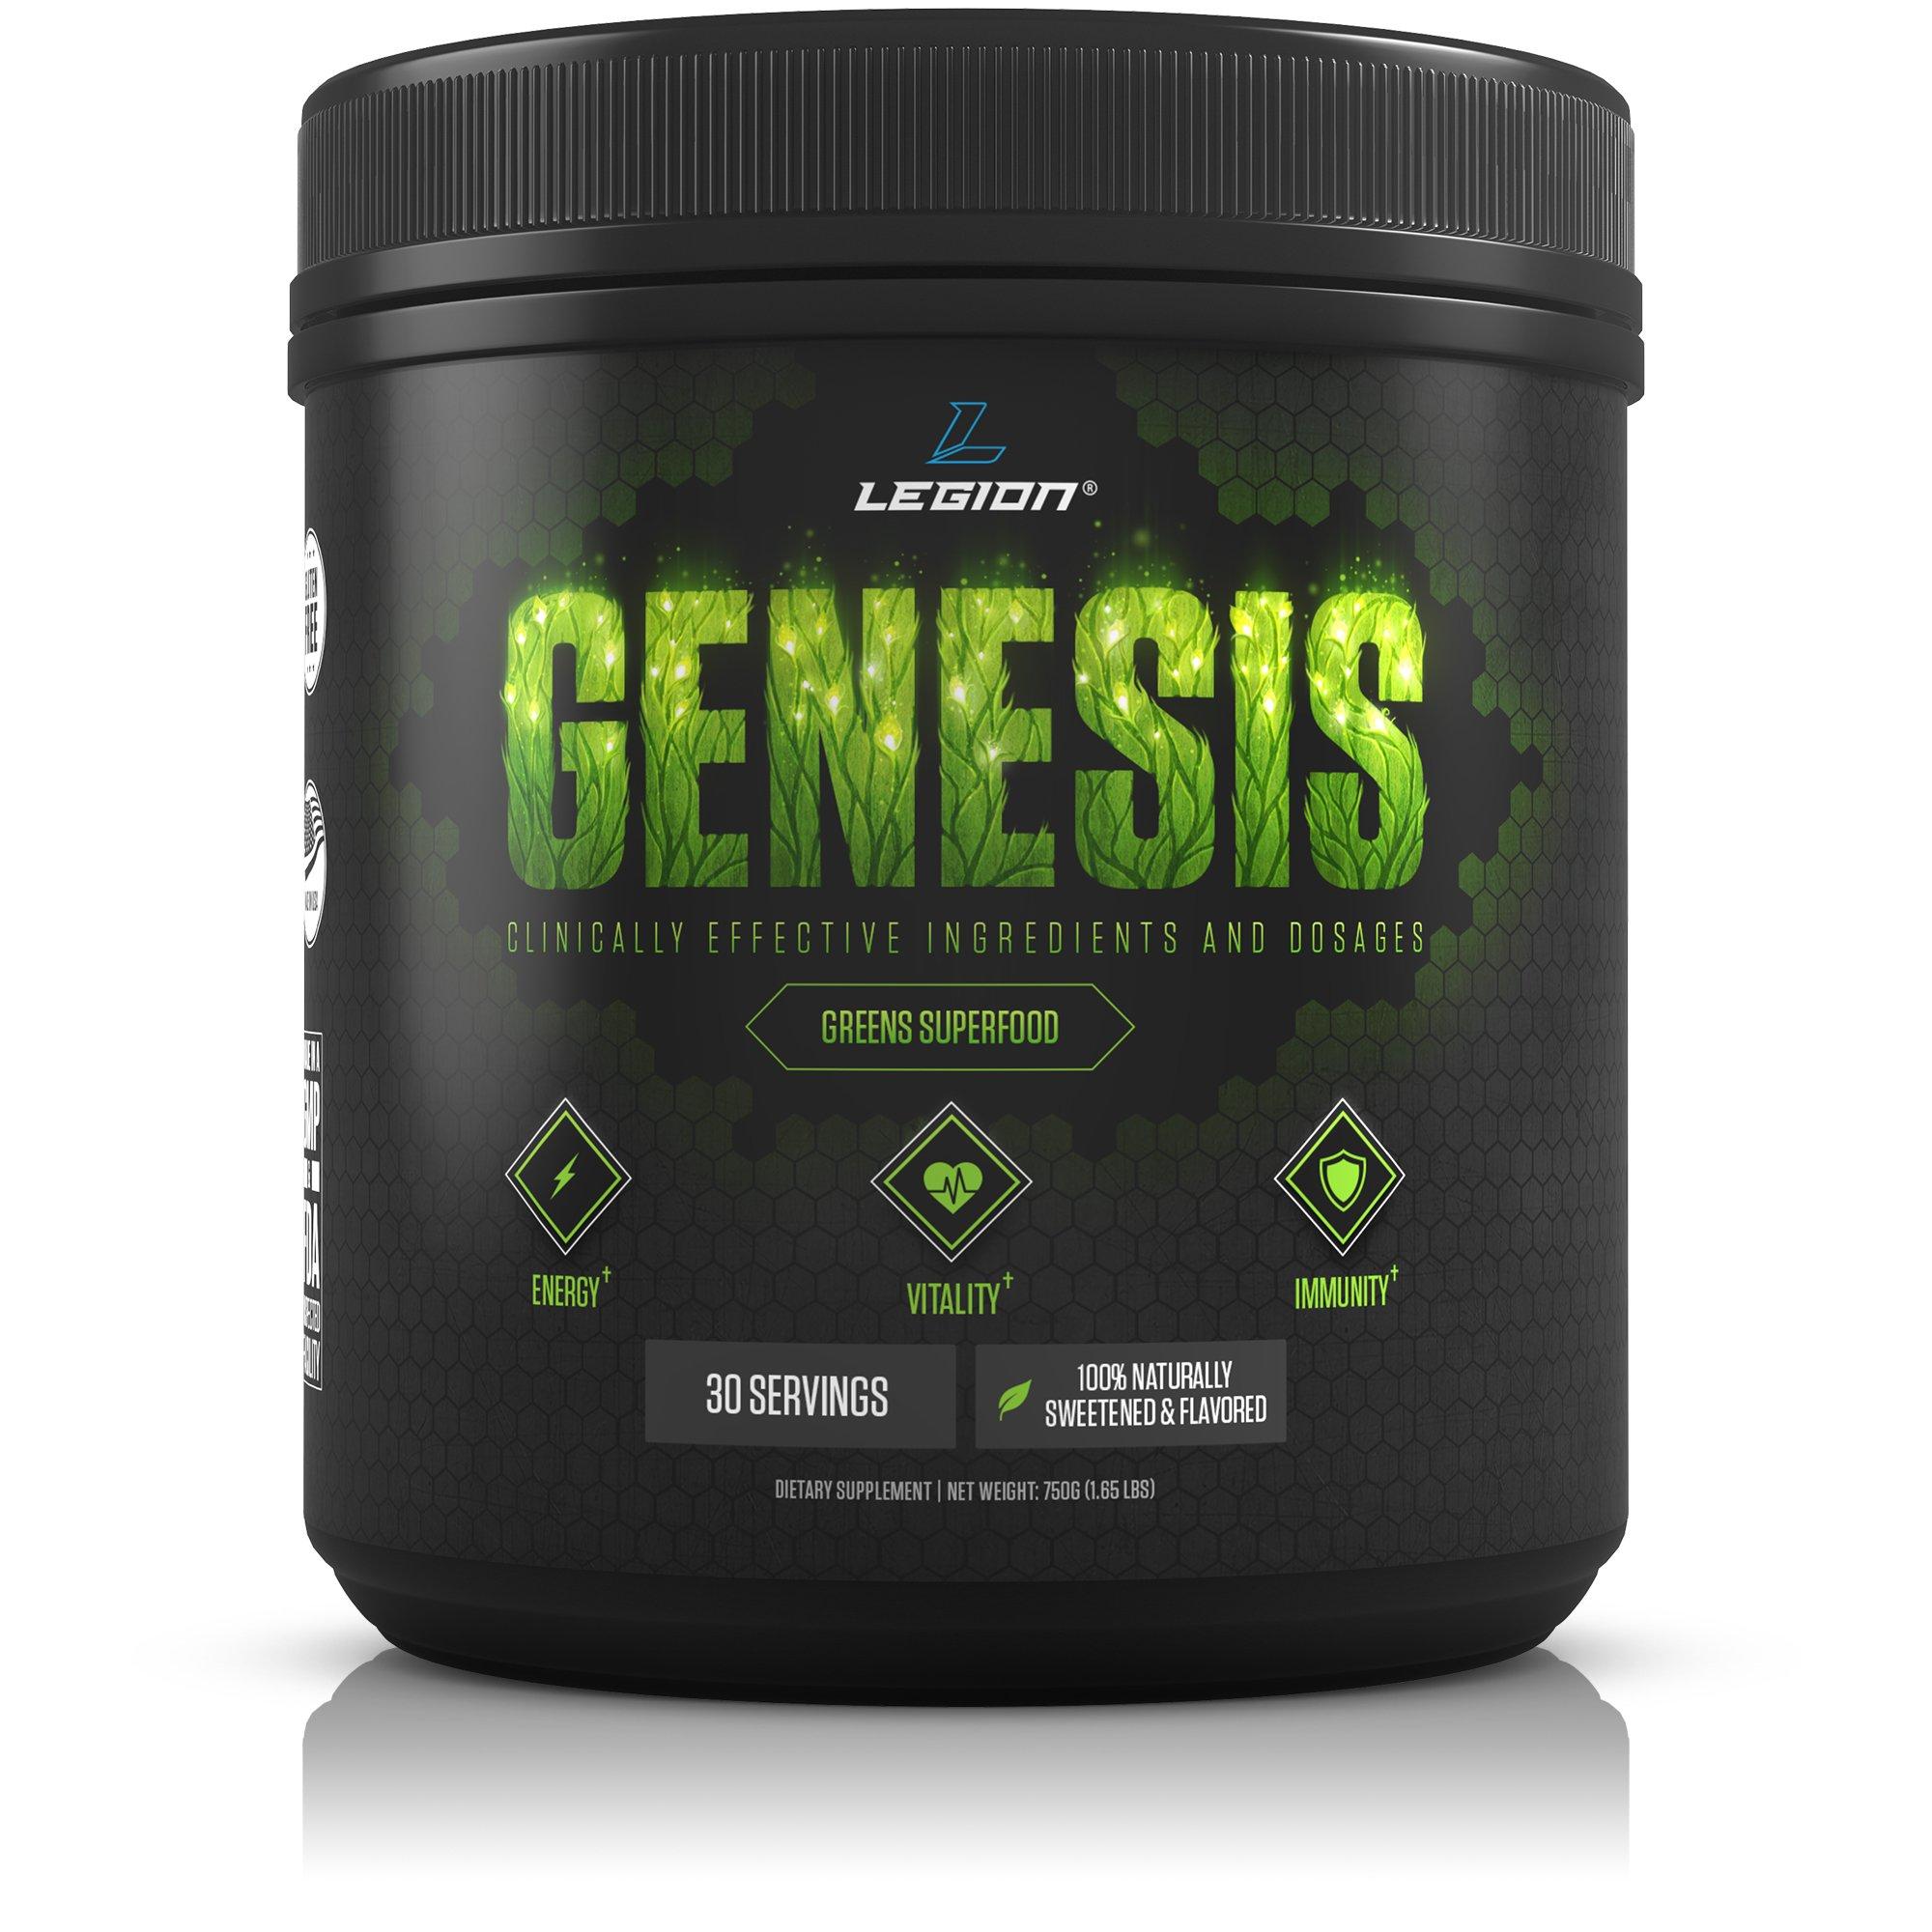 Legion Genesis Green Superfood Powder - All Natural Vegetable Powder with Spirulina, Dandelion, Moringa Oleifera, Maca Powder, Astragalus Root & Reishi Mushroom. 30 Servings.